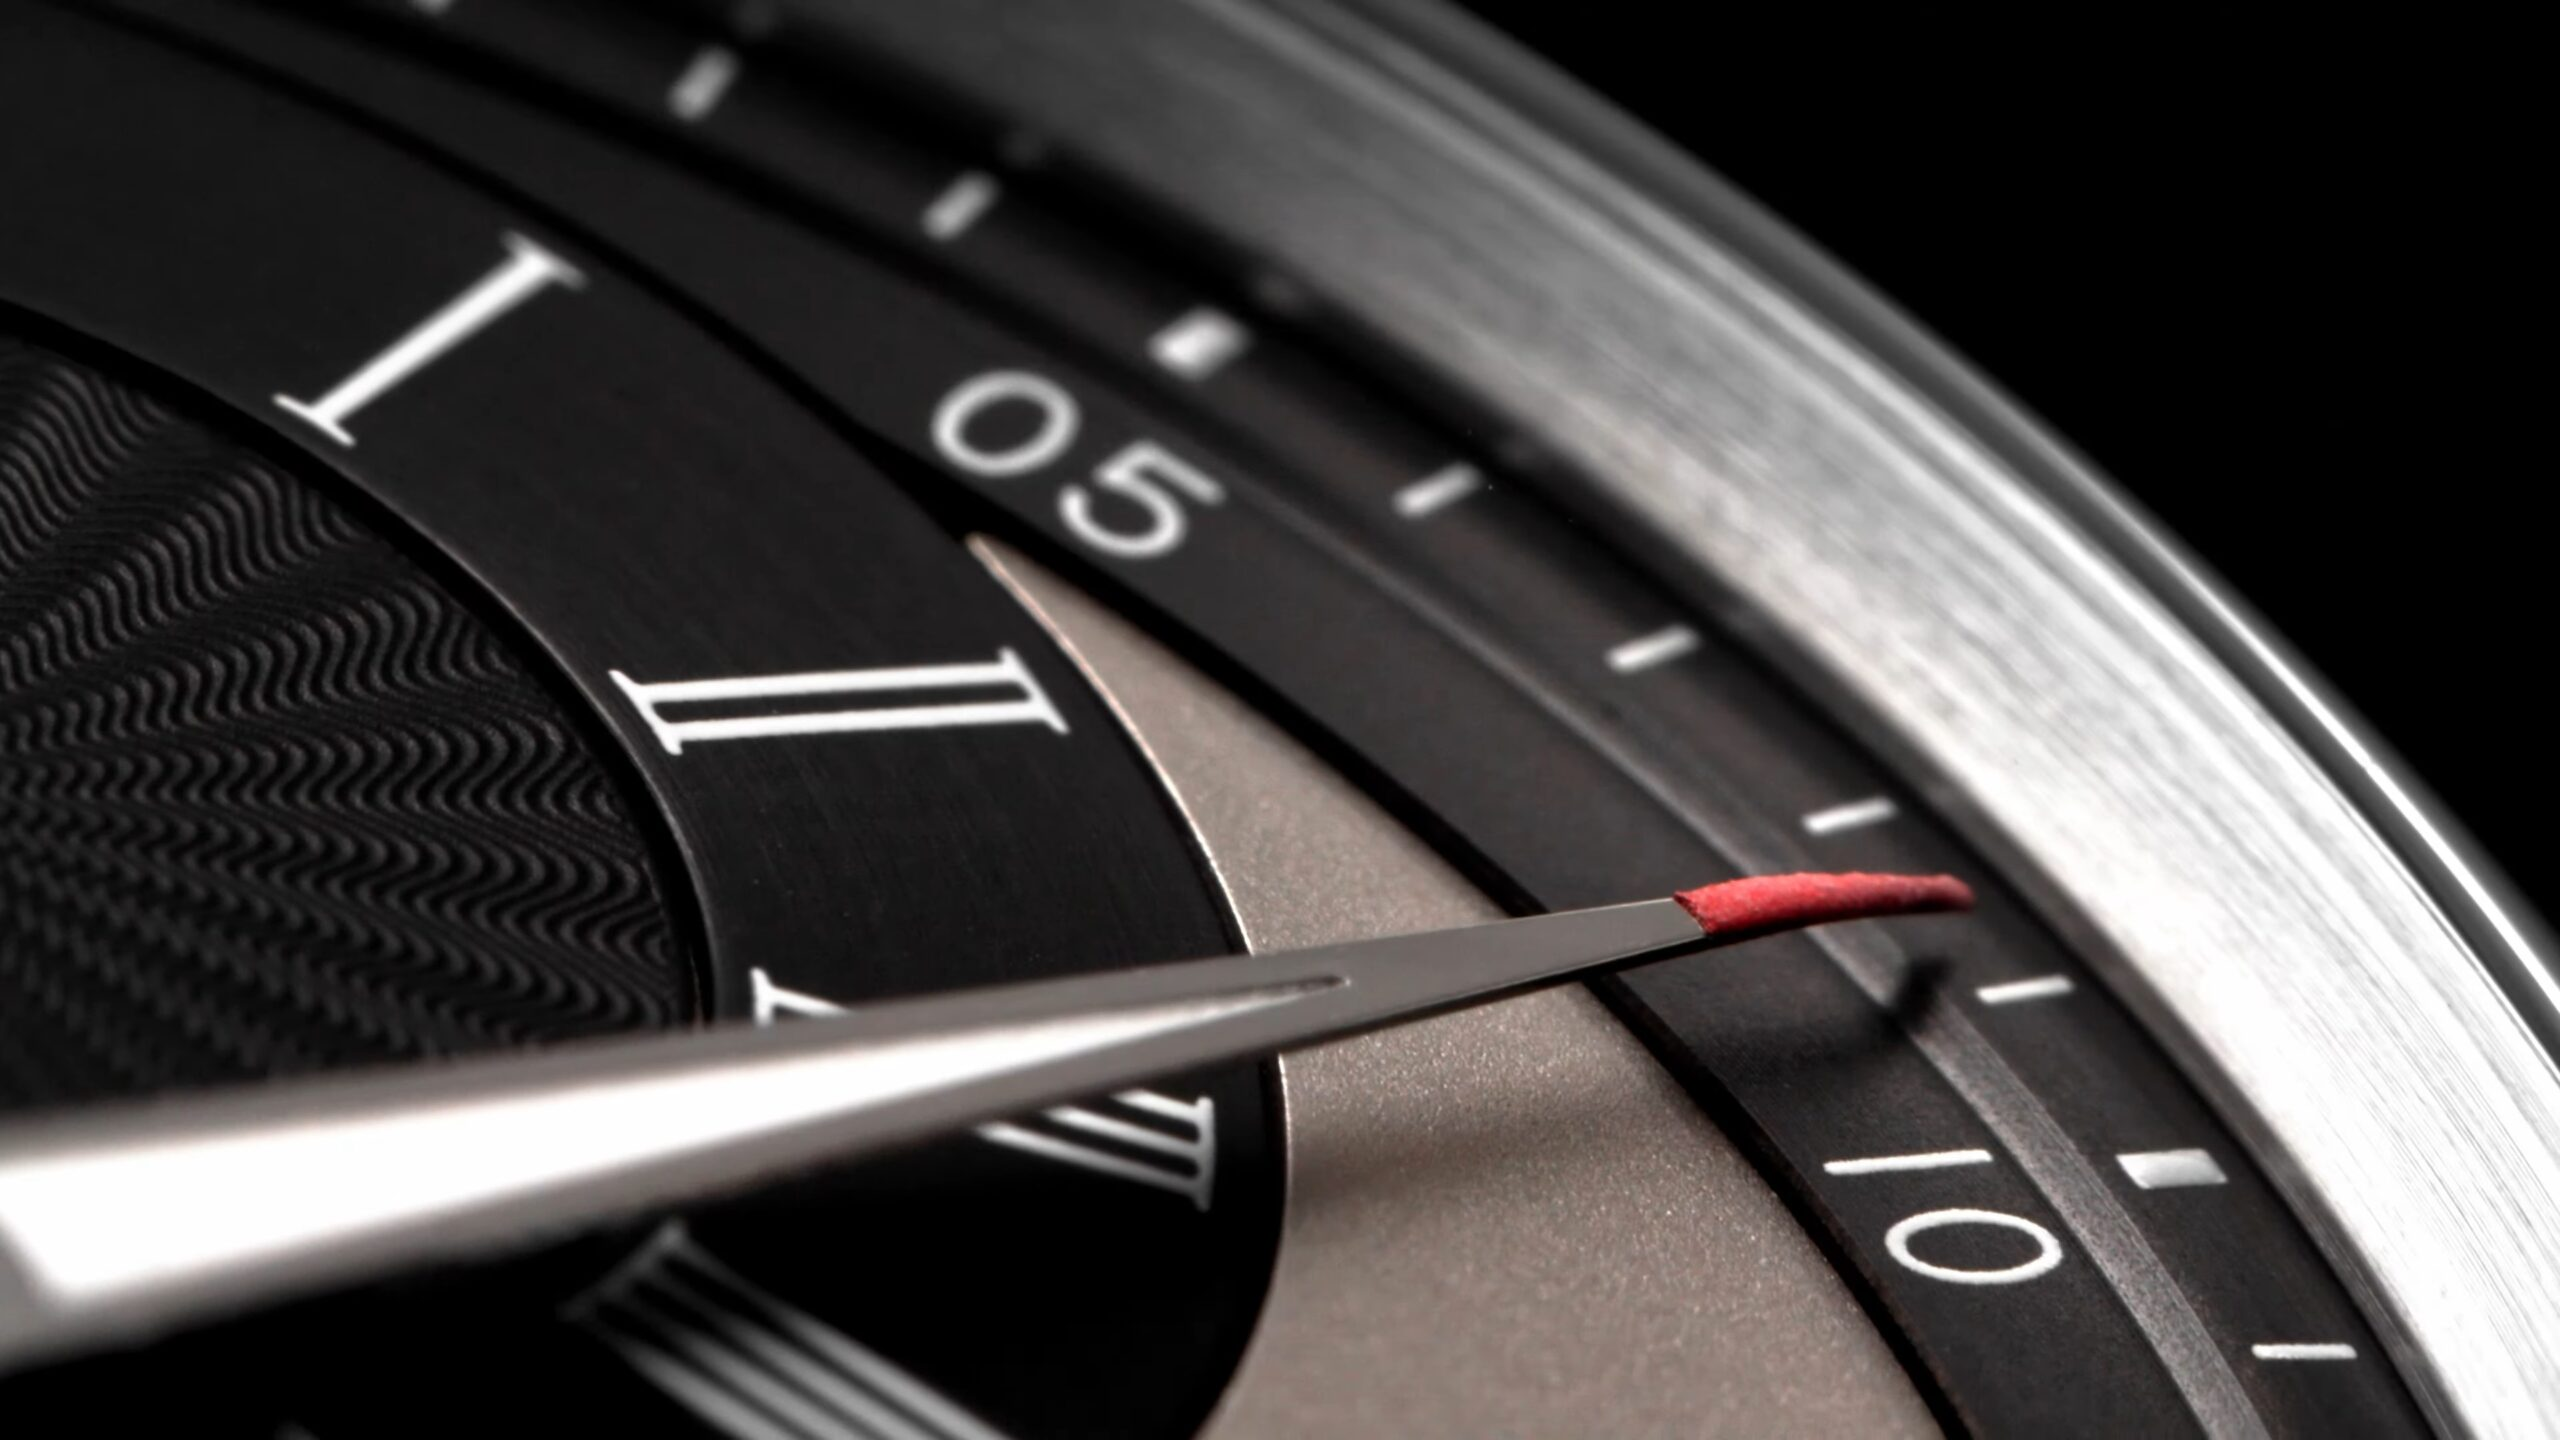 Chronoswiss-Regulator-Classic-Watch-Collection-vidconverter.co_.webm_snapshot_00.21